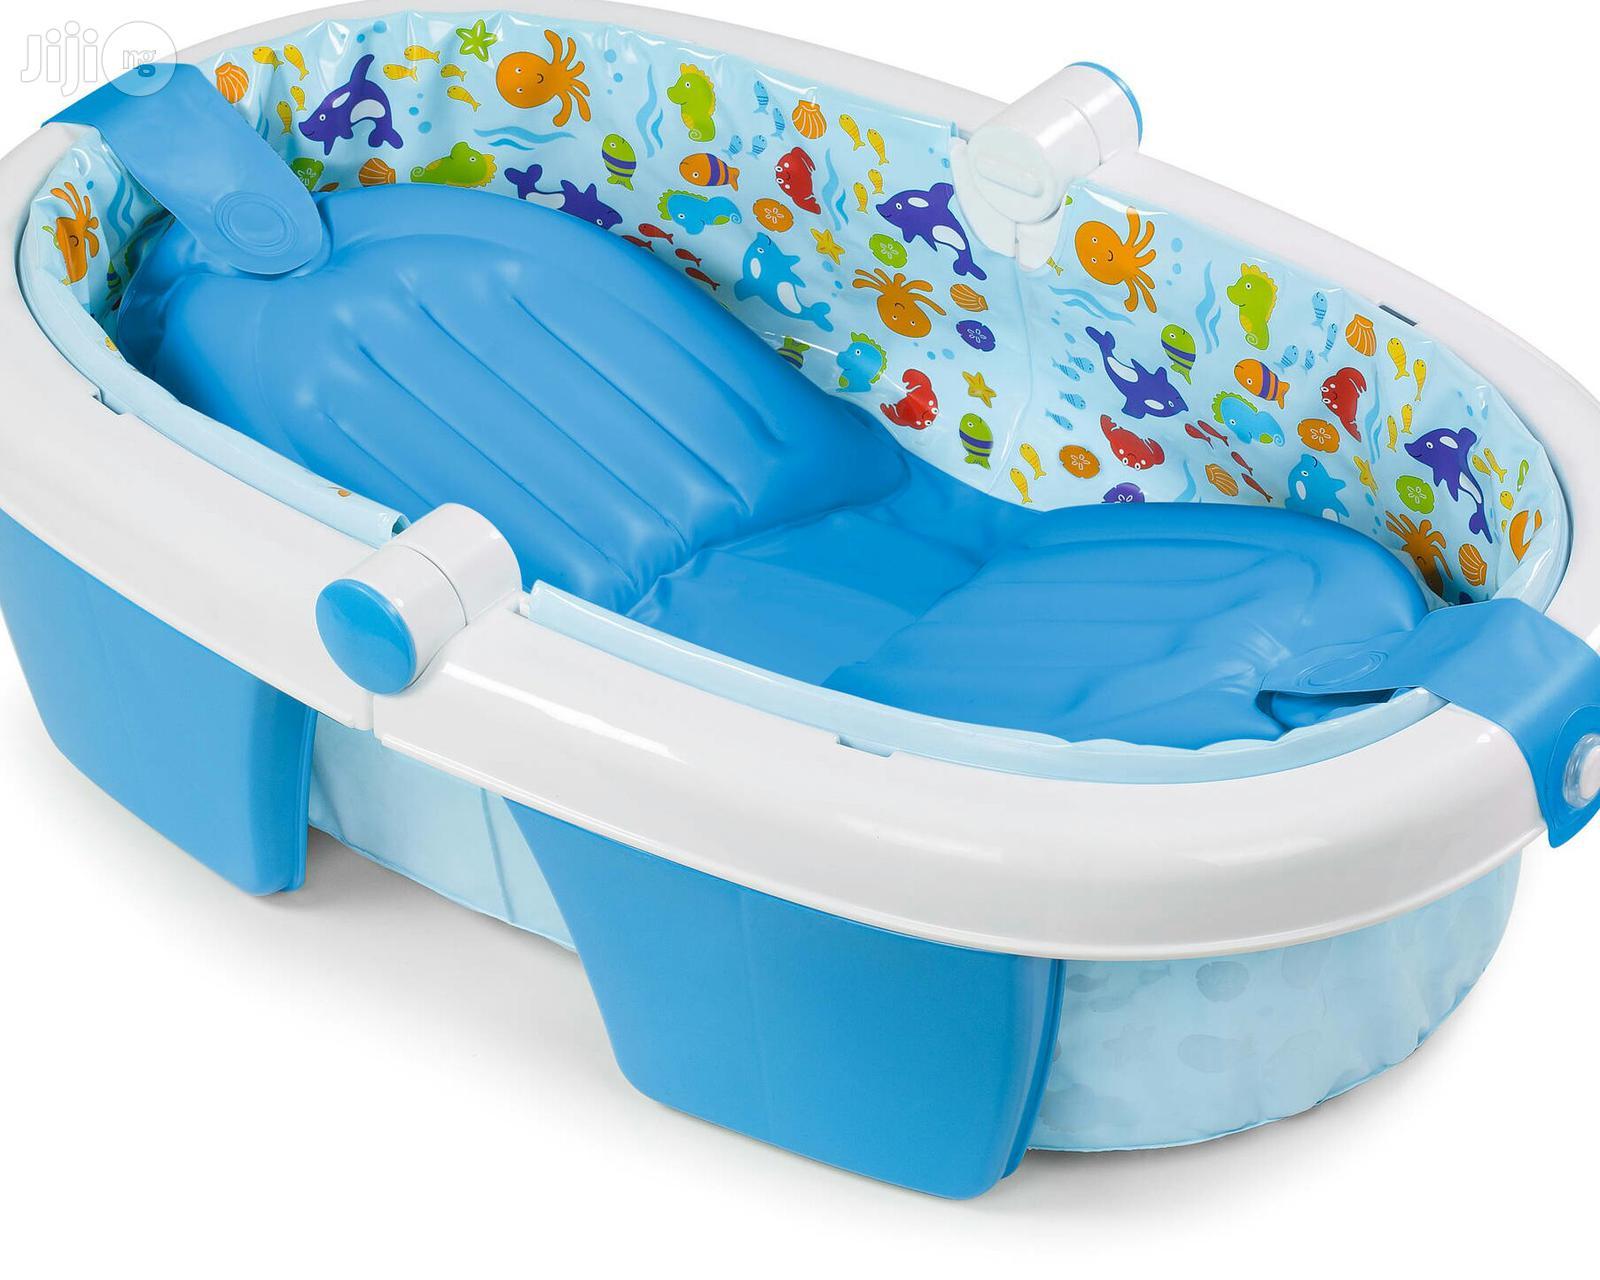 Baby Bath With Tub (USA)